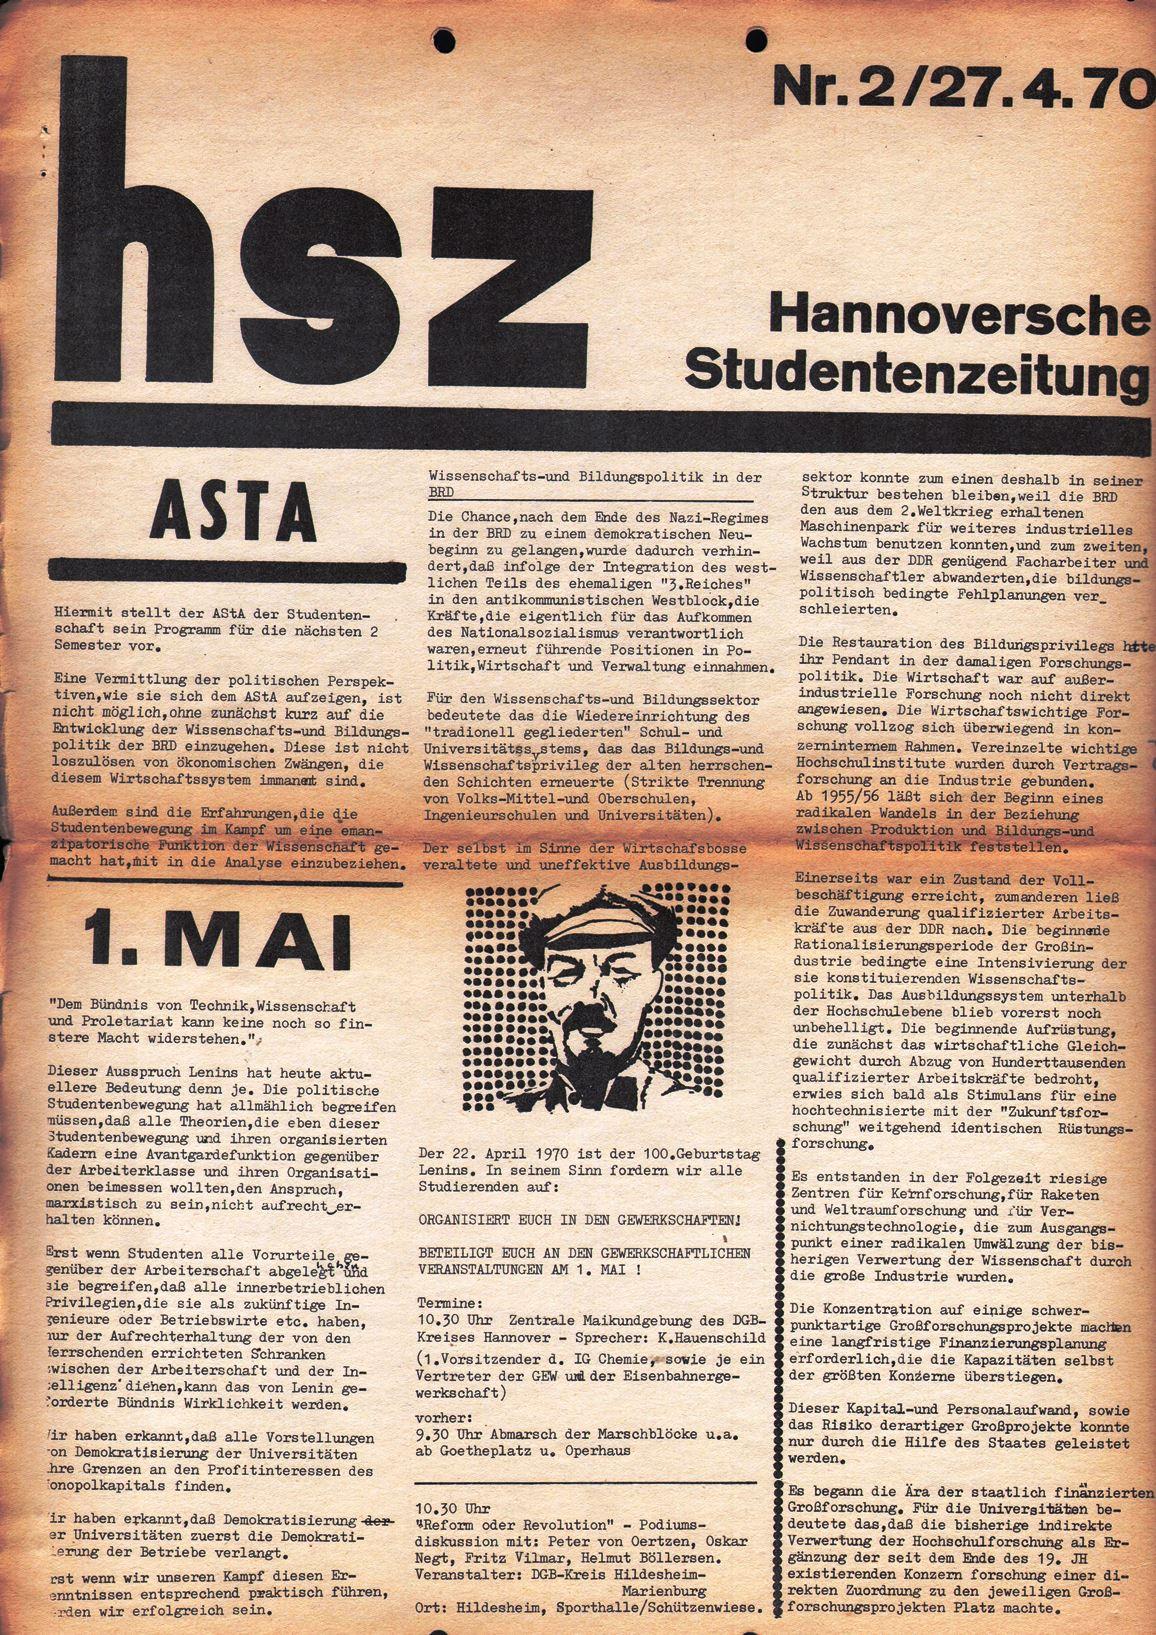 Hannover_HSZ033